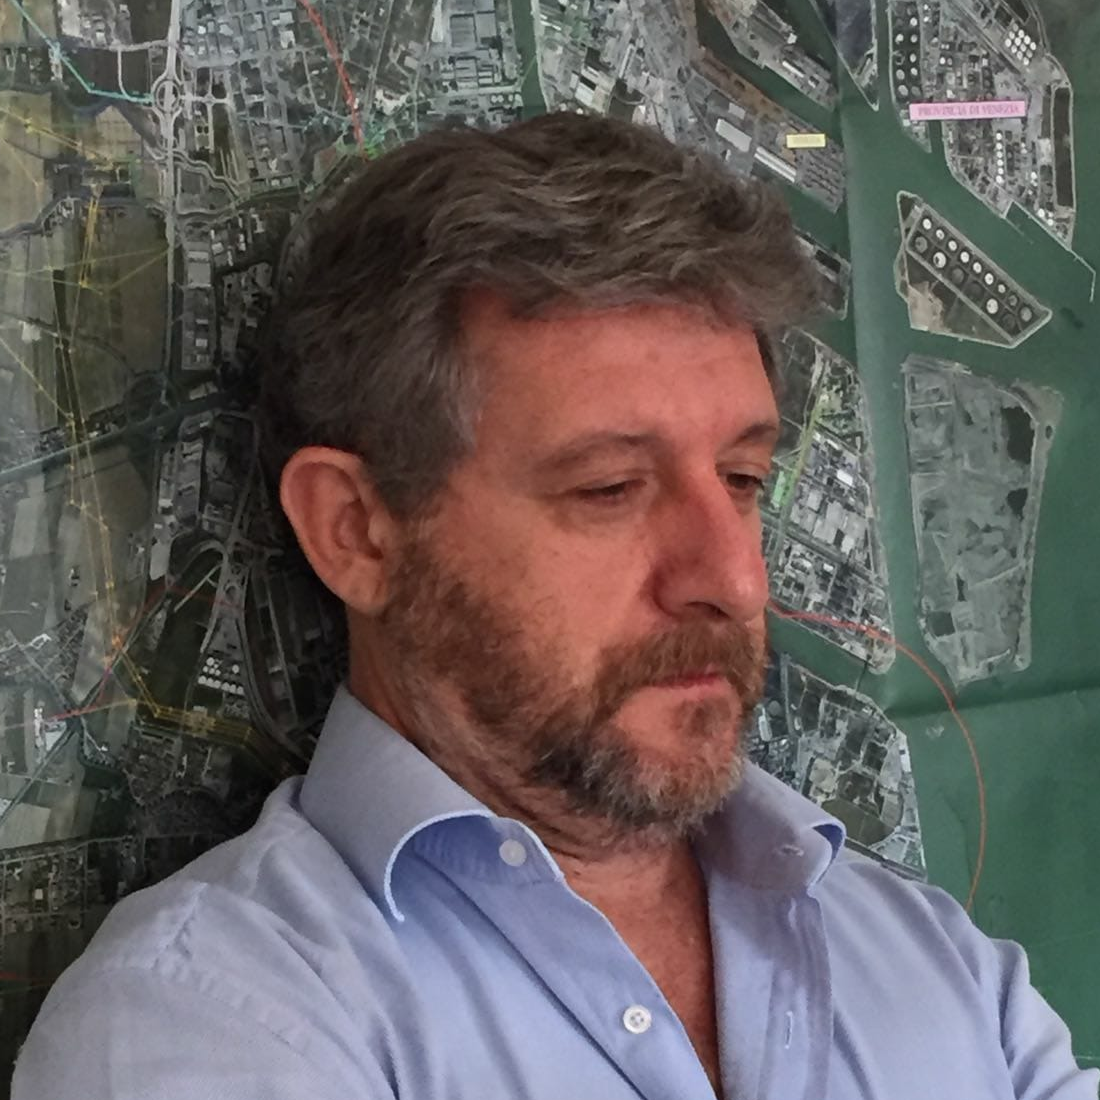 Giovanni Pineschi